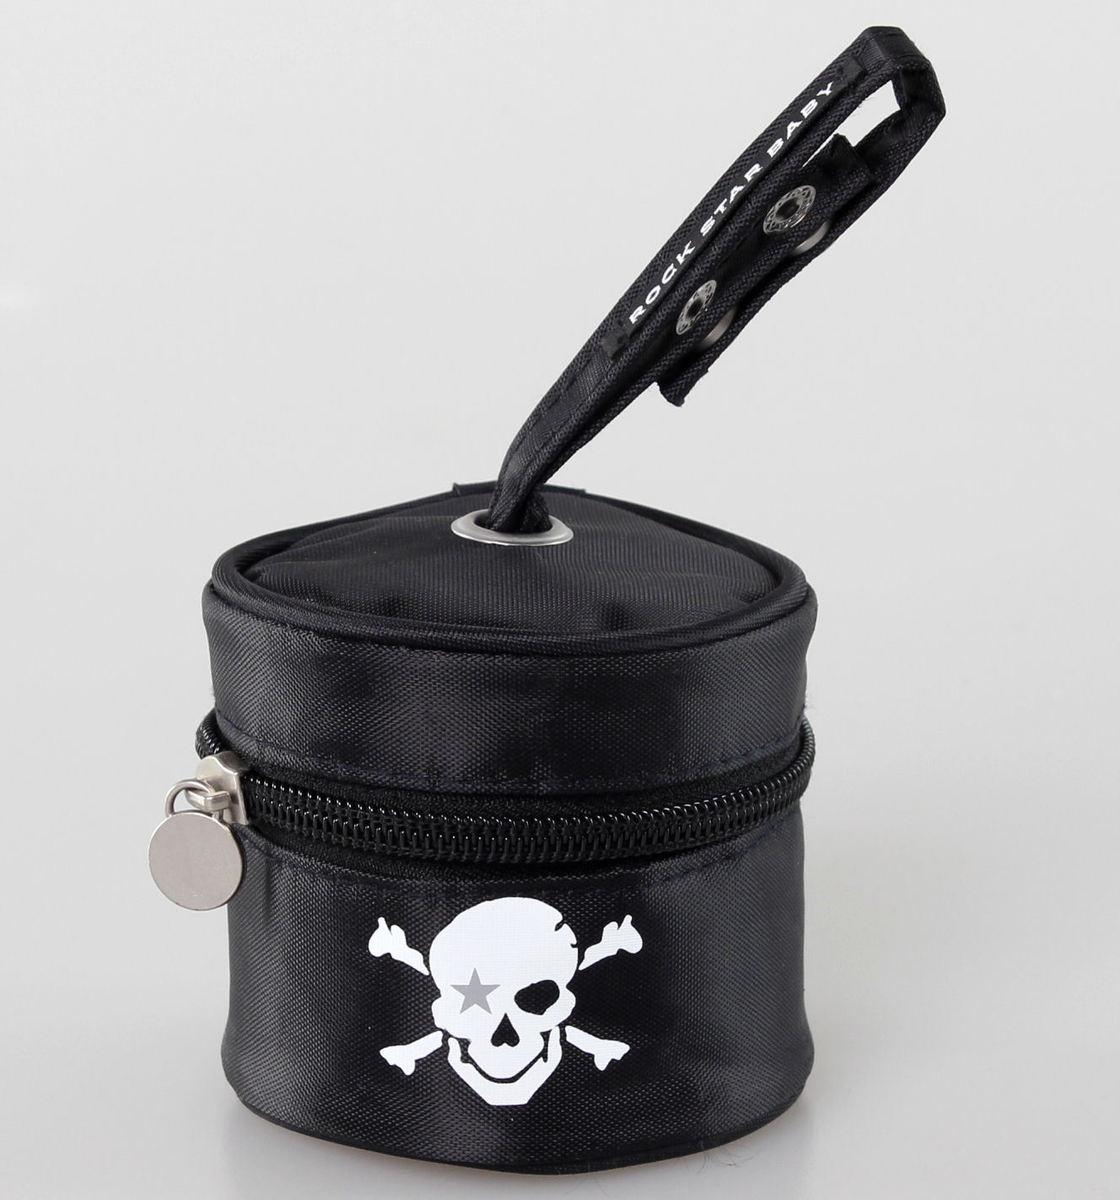 taštička na dudlík ROCK STAR BABY - Pirat - 90097